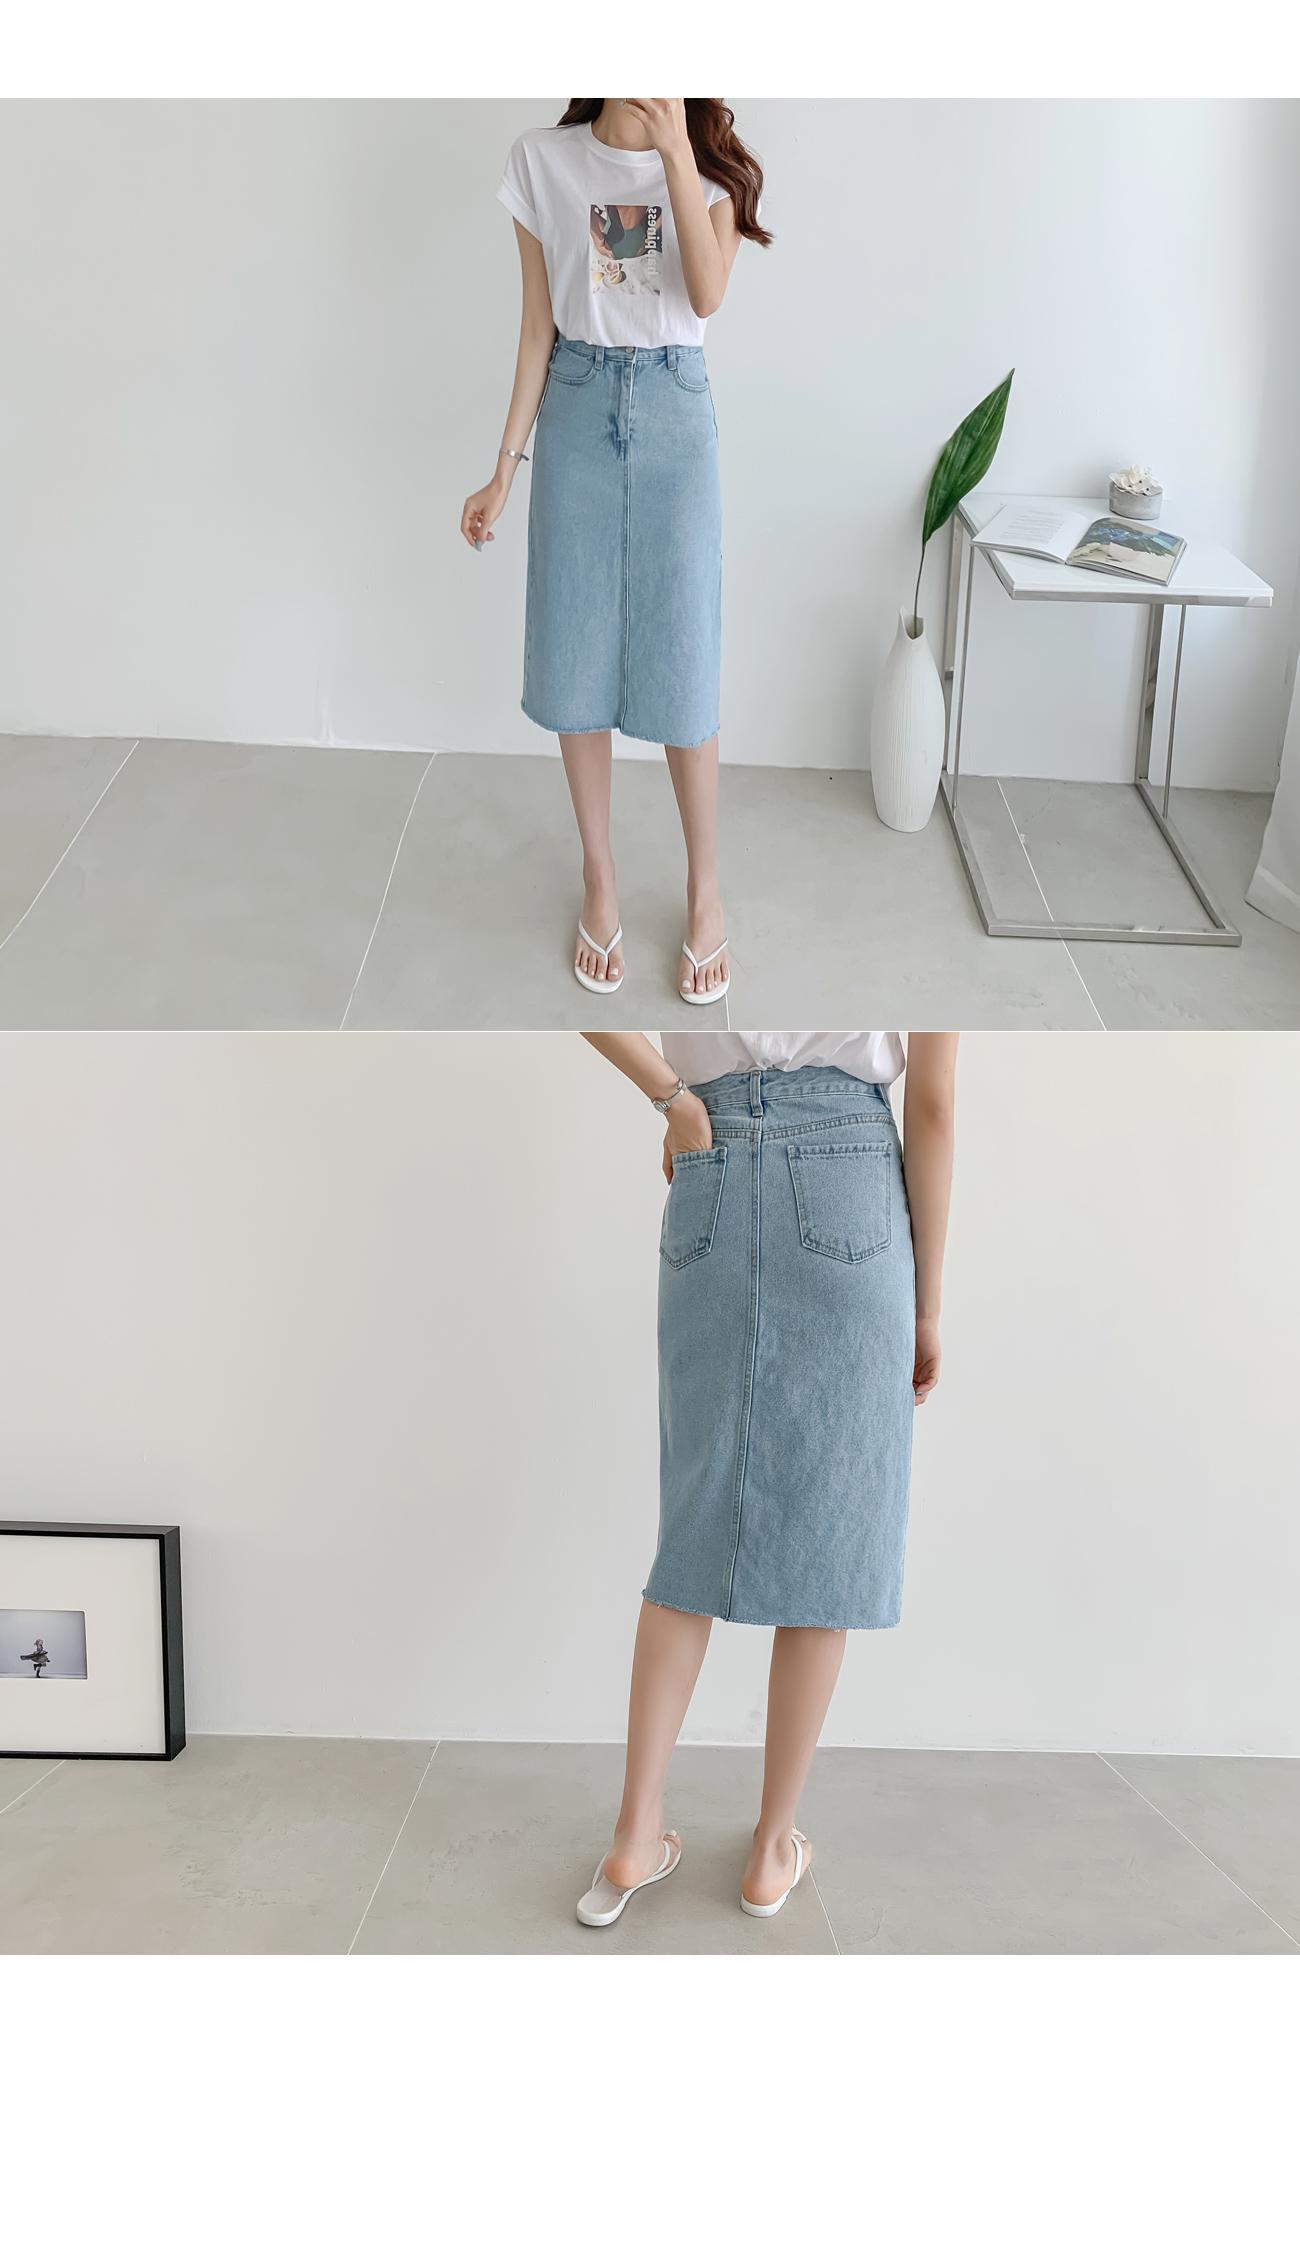 Unbalt H Denim Skirt #51139 Blue S Available